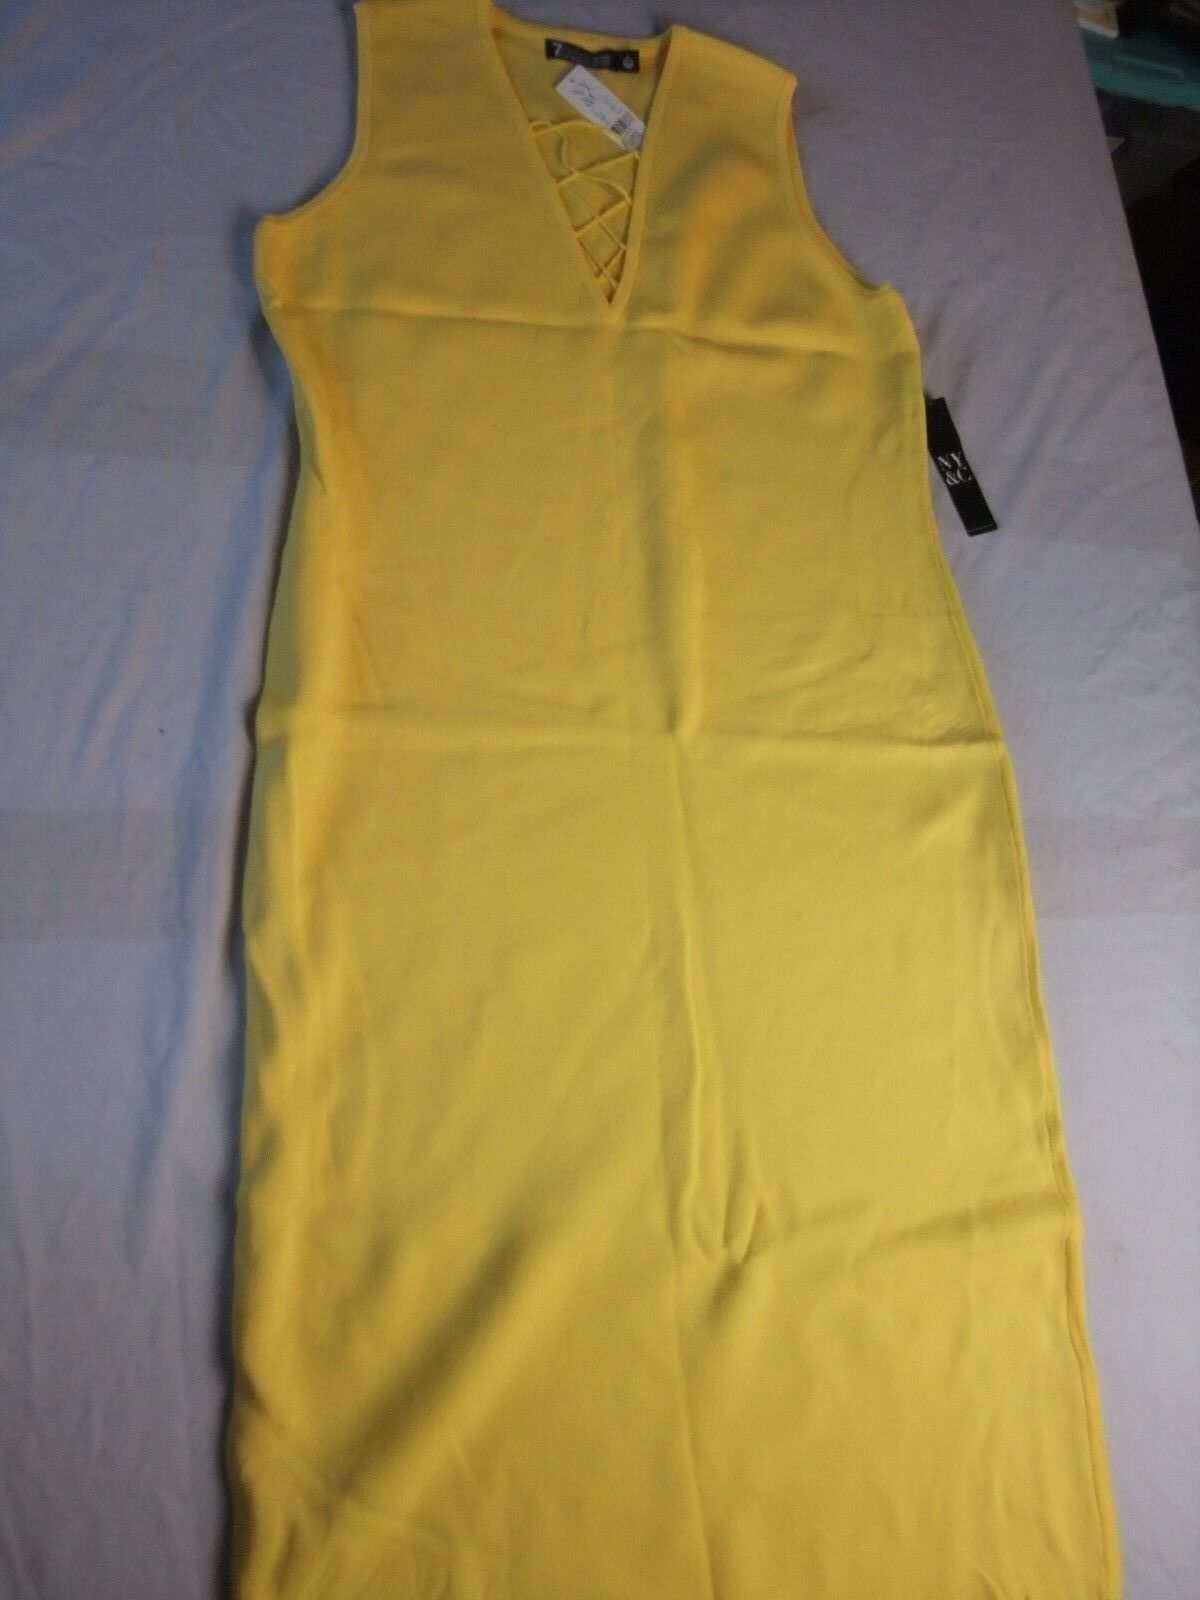 NY & Company 7th Avenue Women's Yellow Sweater Dress Size Large Petite--NWT